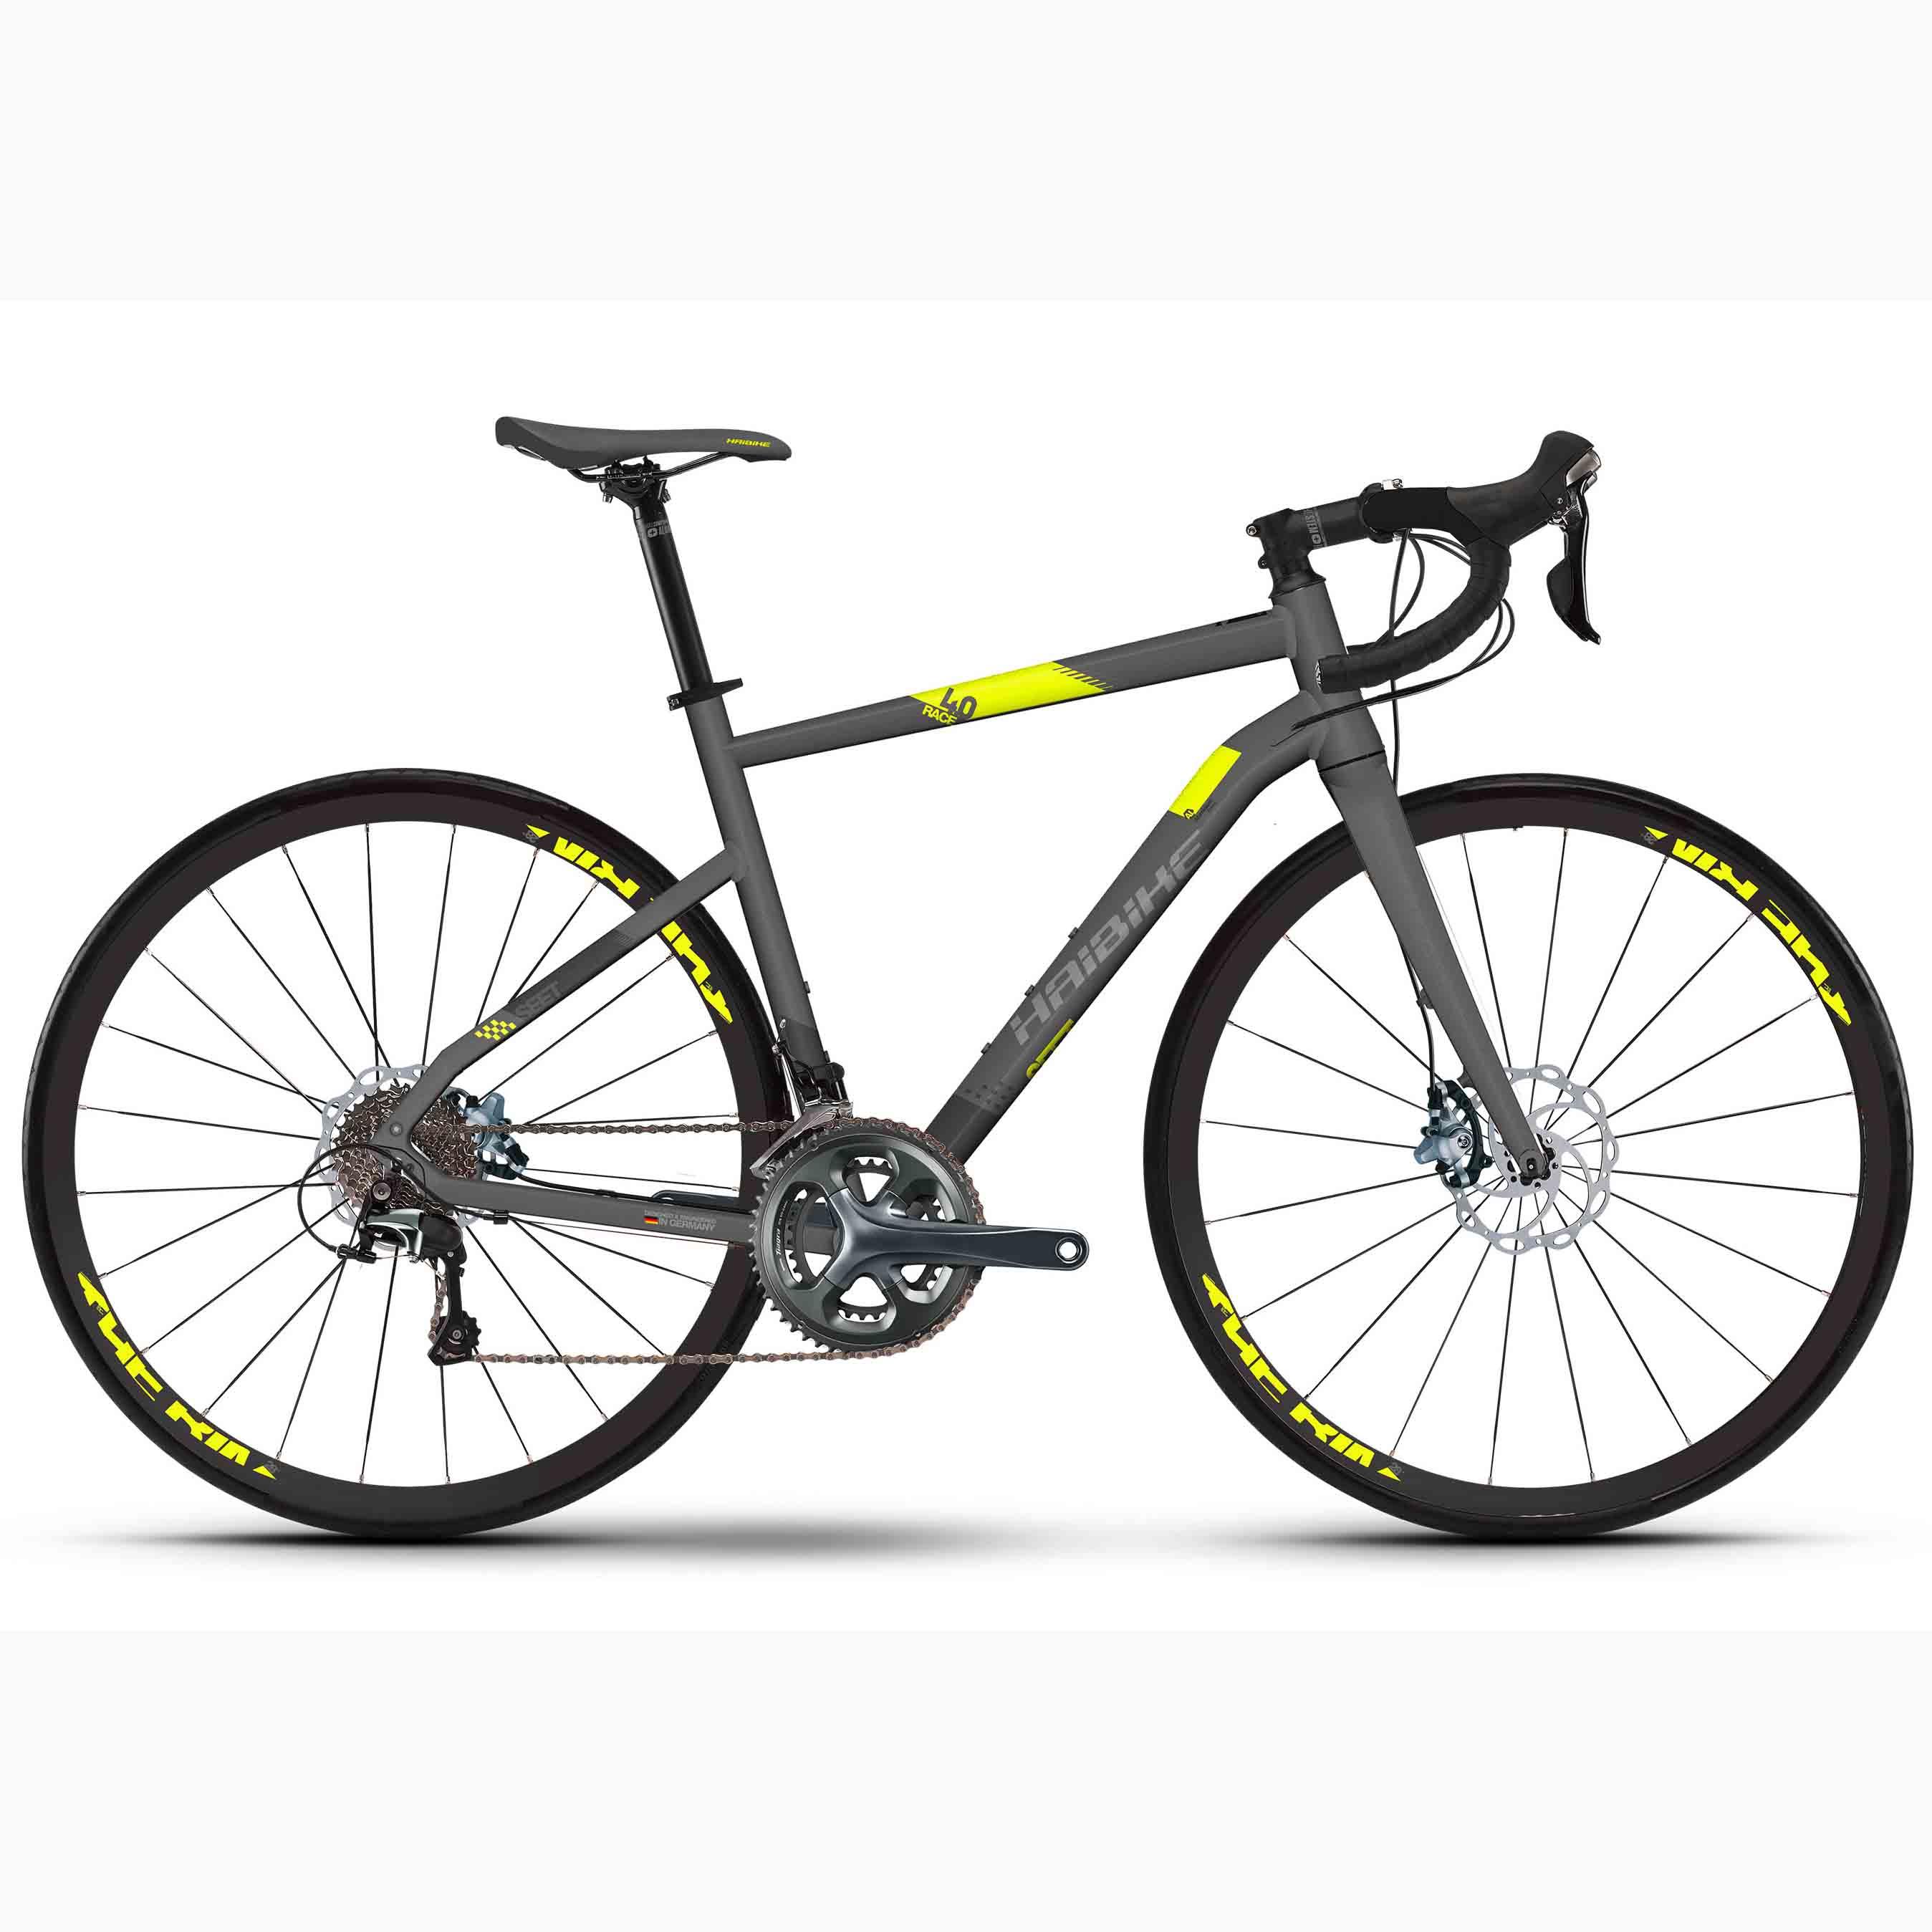 Фото Велосипед Haibike SEET Race 4.0 28″, рама 50см, 2018